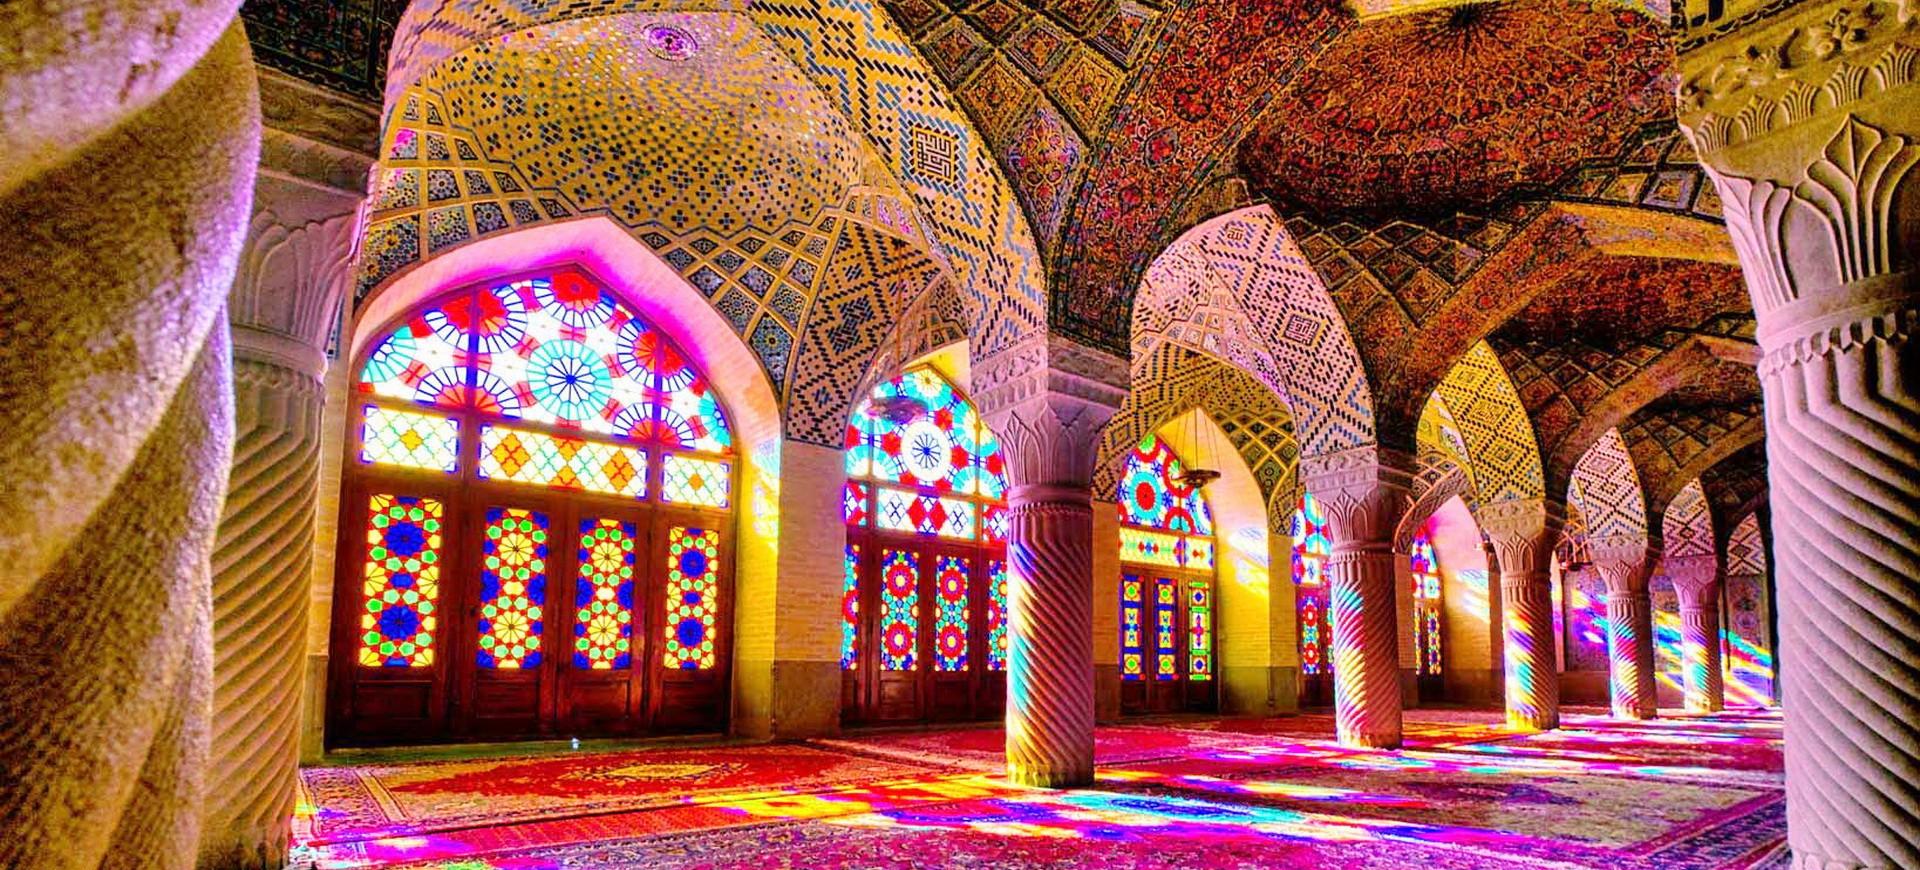 Mosquée Nasir ol  Molk à Chiraz en Iran